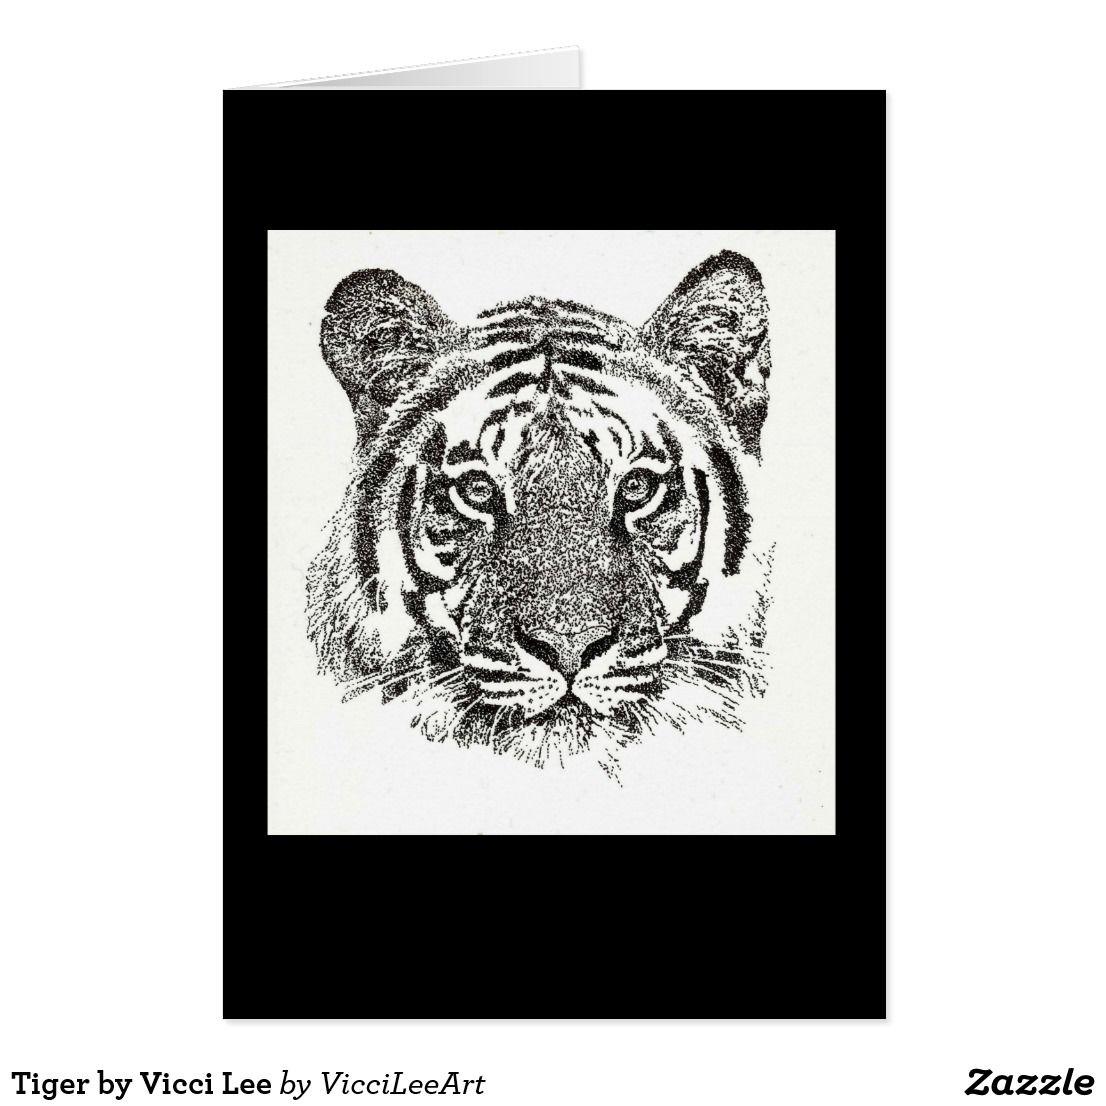 Tiger by Vicci Lee Zazzle.co.uk in 2019 Illustration